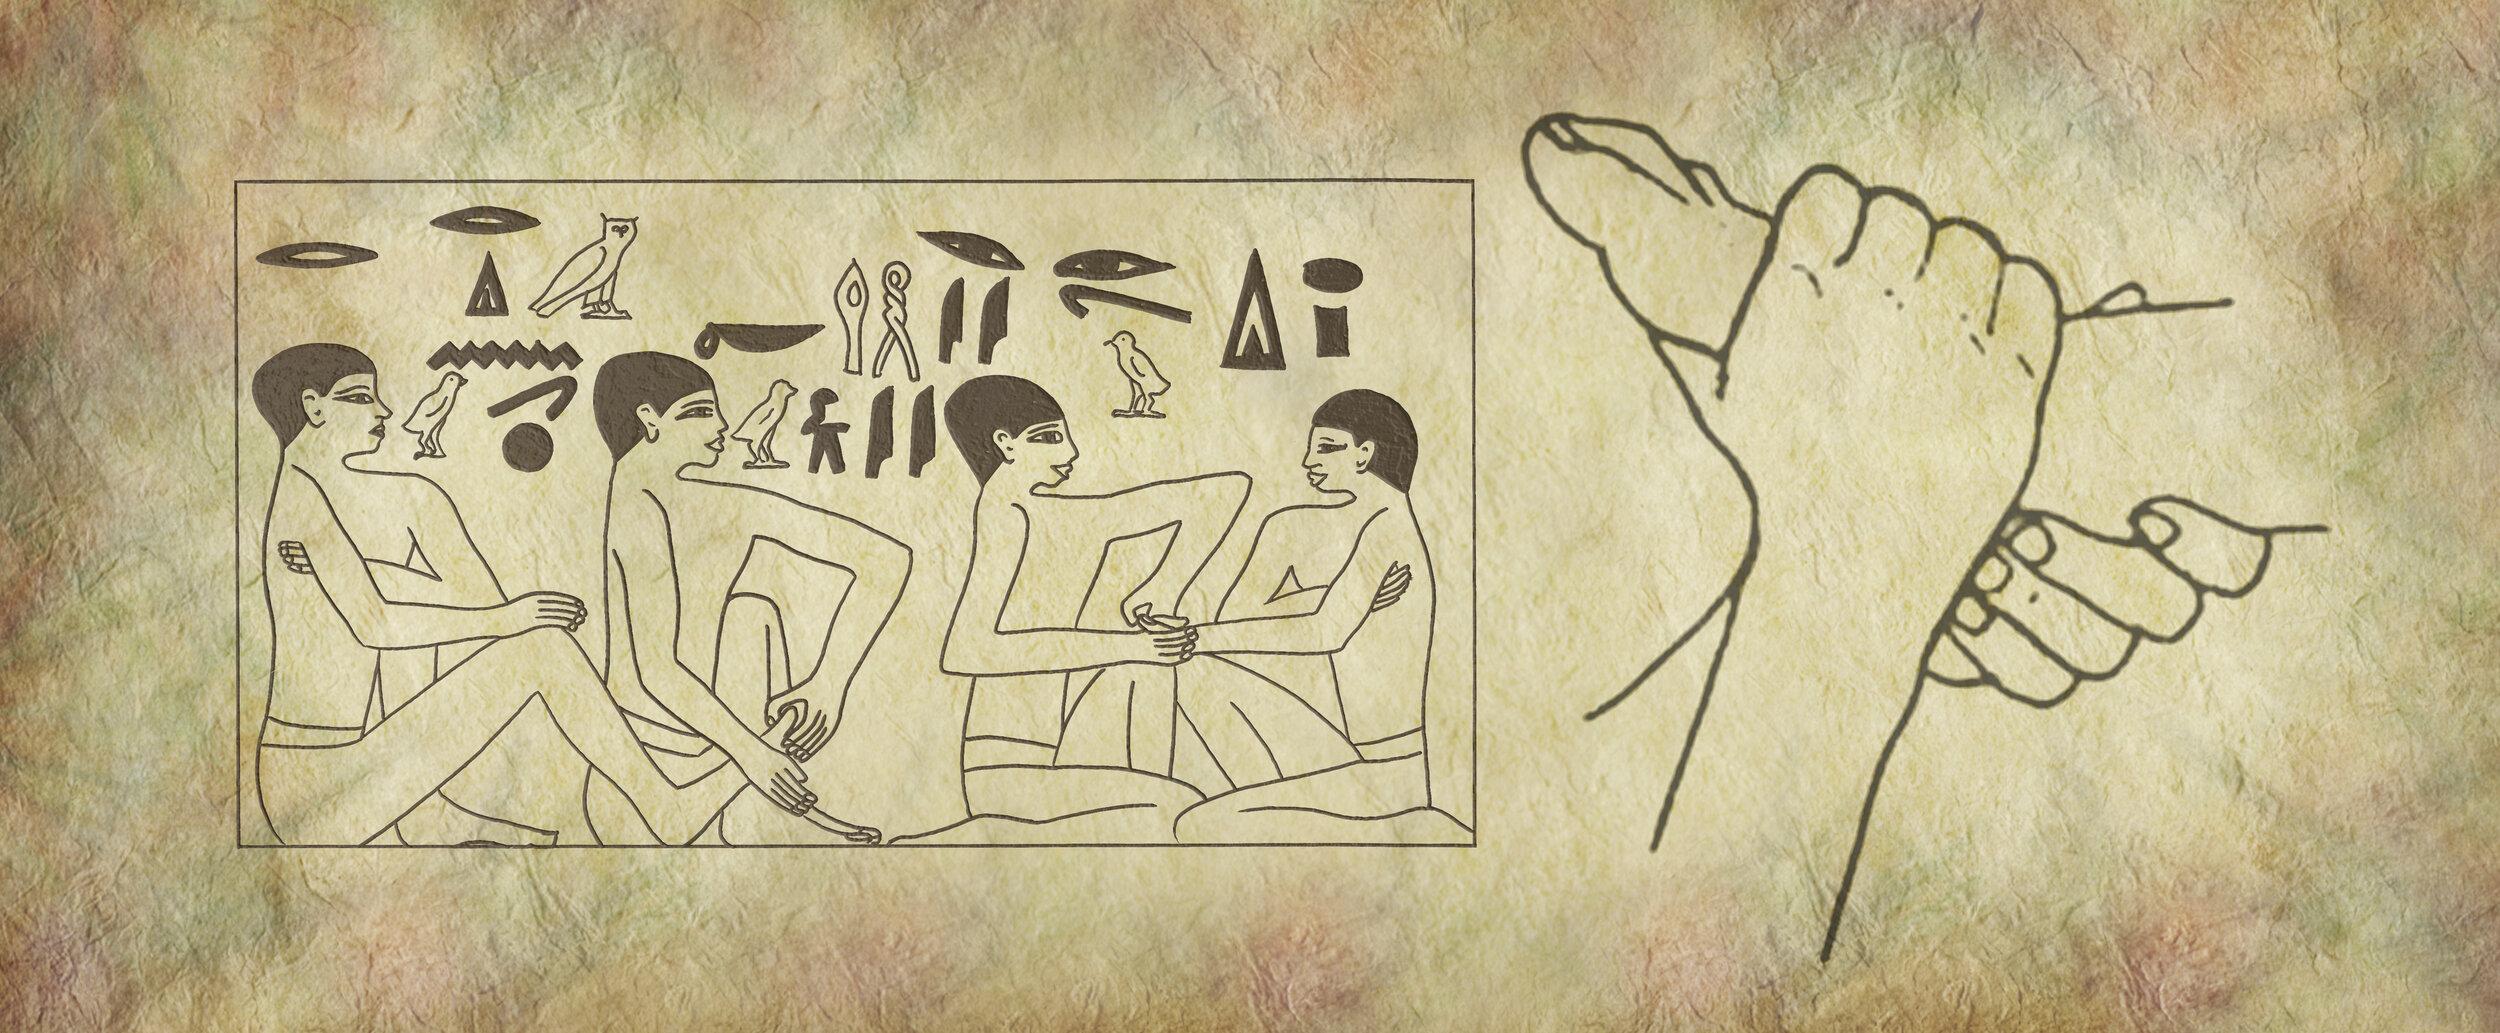 MMG-Reflexology-Ancient-Practice.jpeg